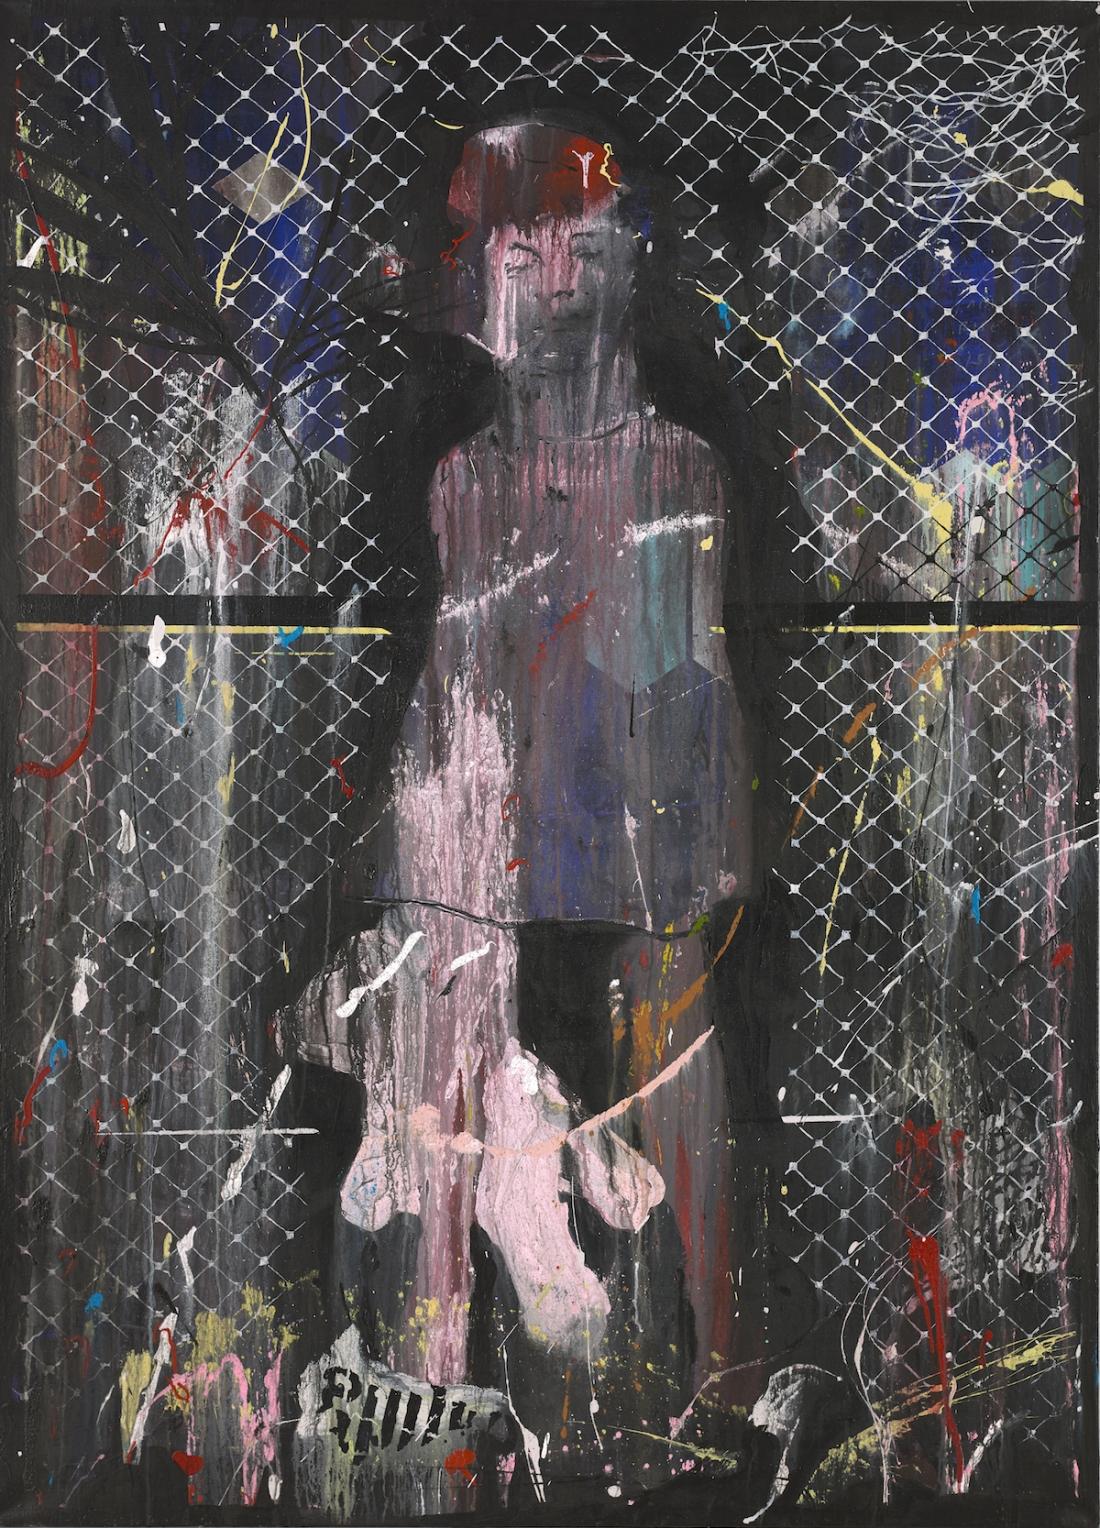 Sleepwalk II - Girl By A Fence | Dan Baldwin | Maddox Gallery